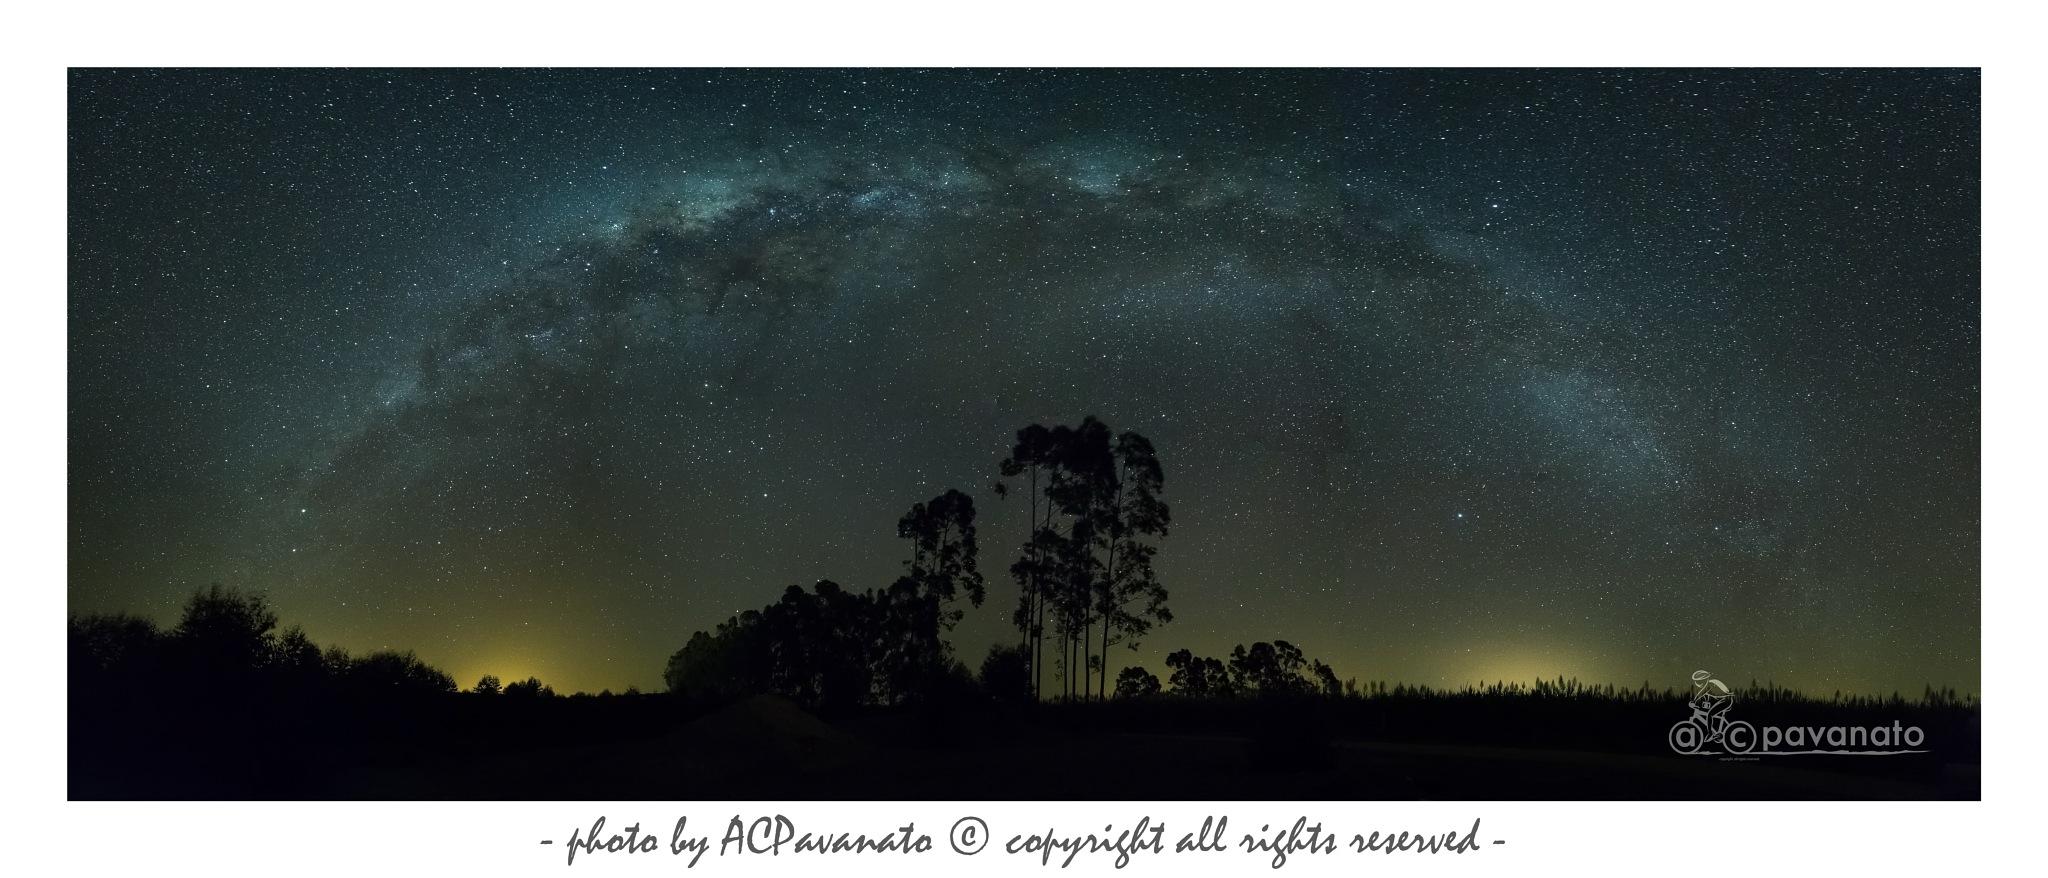 Milky way by ACPavanato